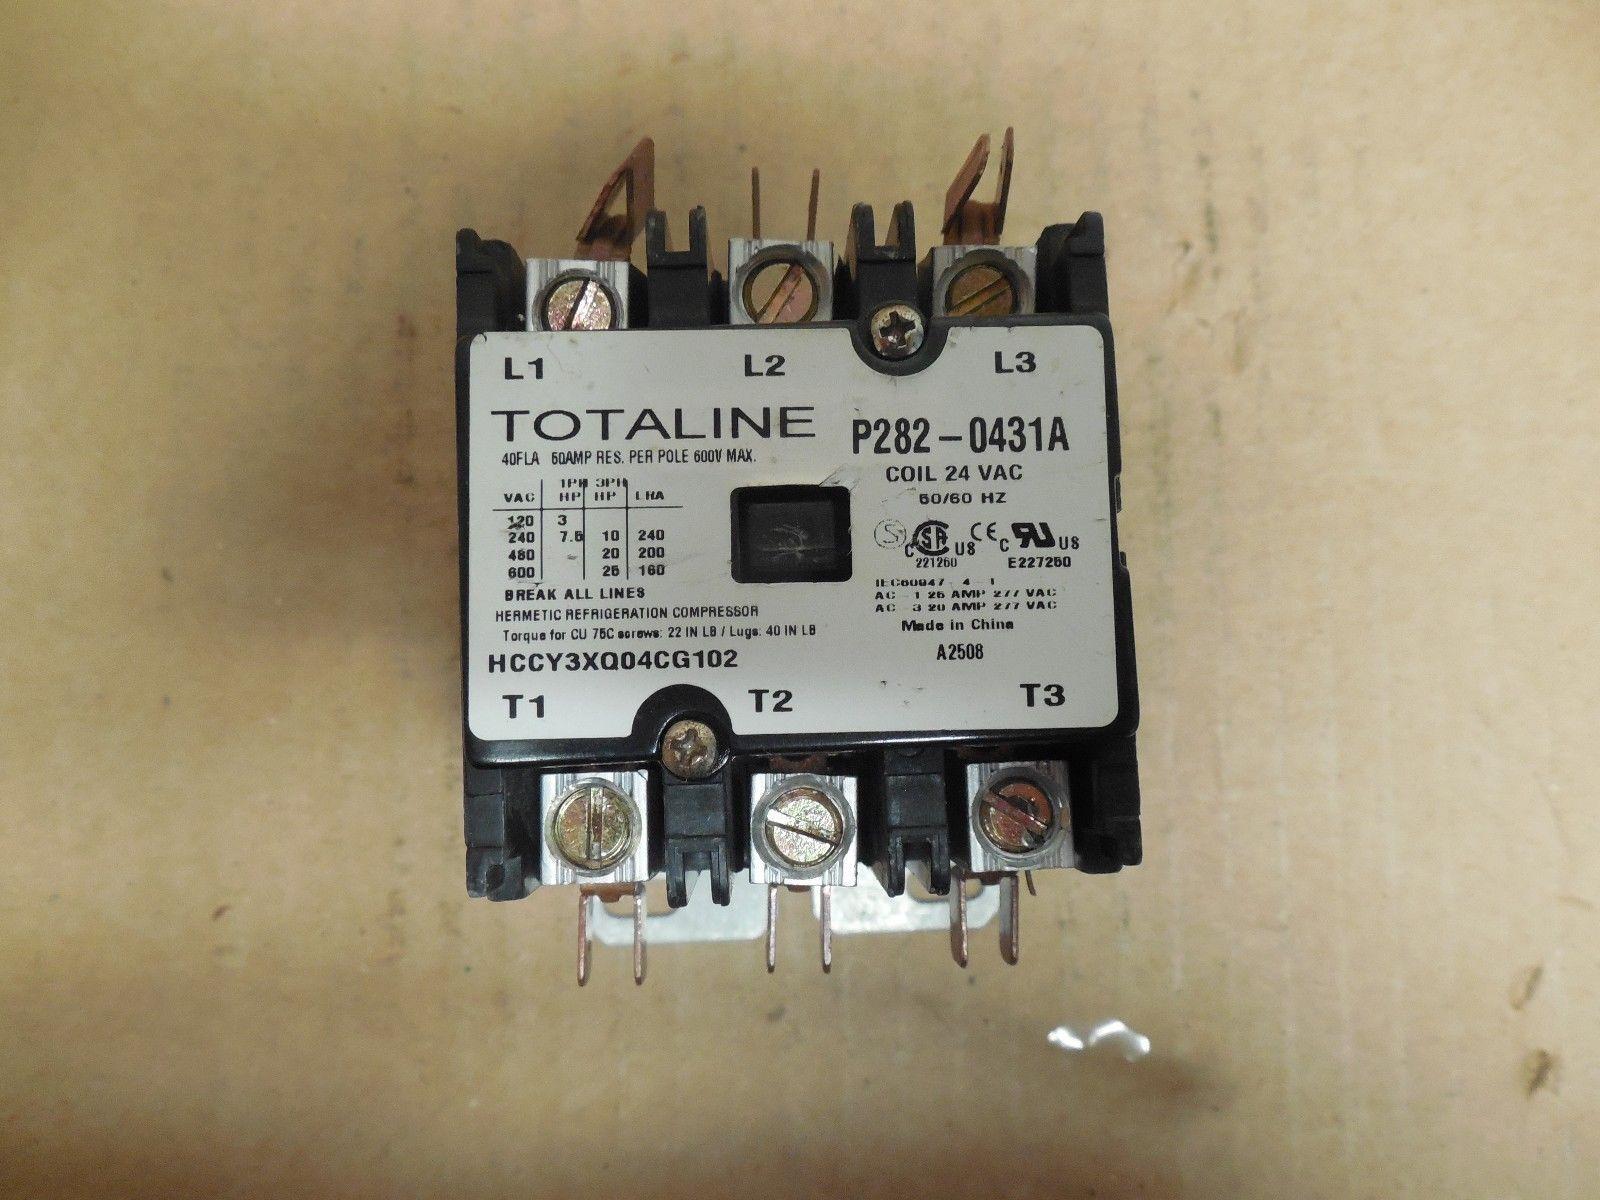 HVAC Contactor 3 Pole 40 FLA 50A 24 VAC Coil TOTALINE P282